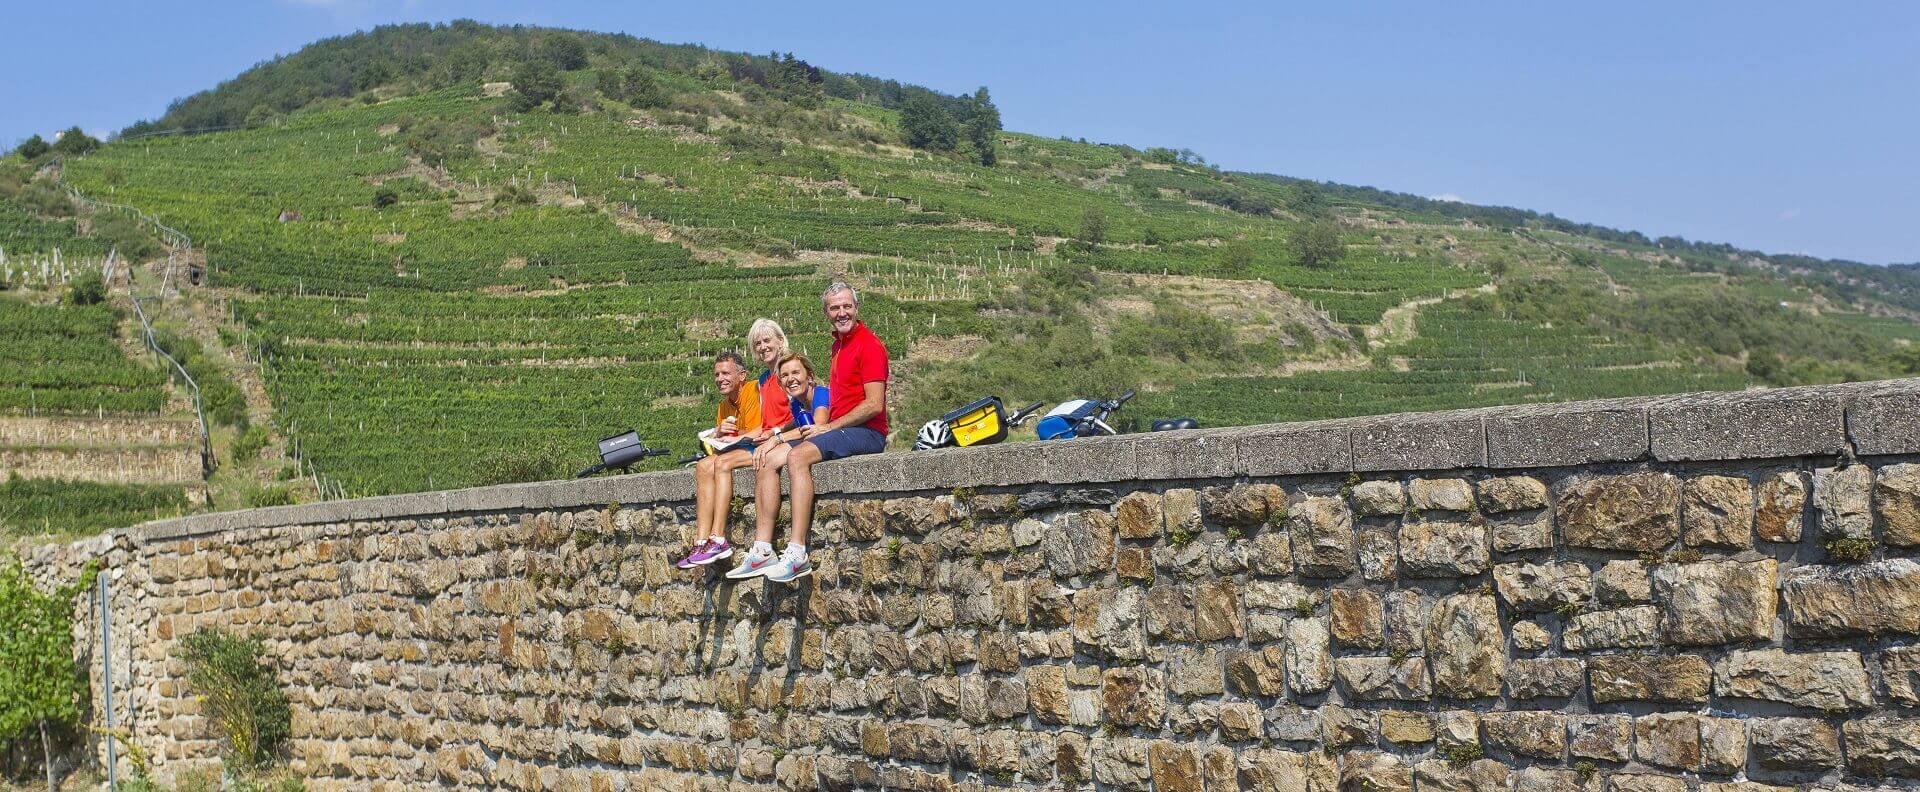 Langs Donau fra Passau til Wien